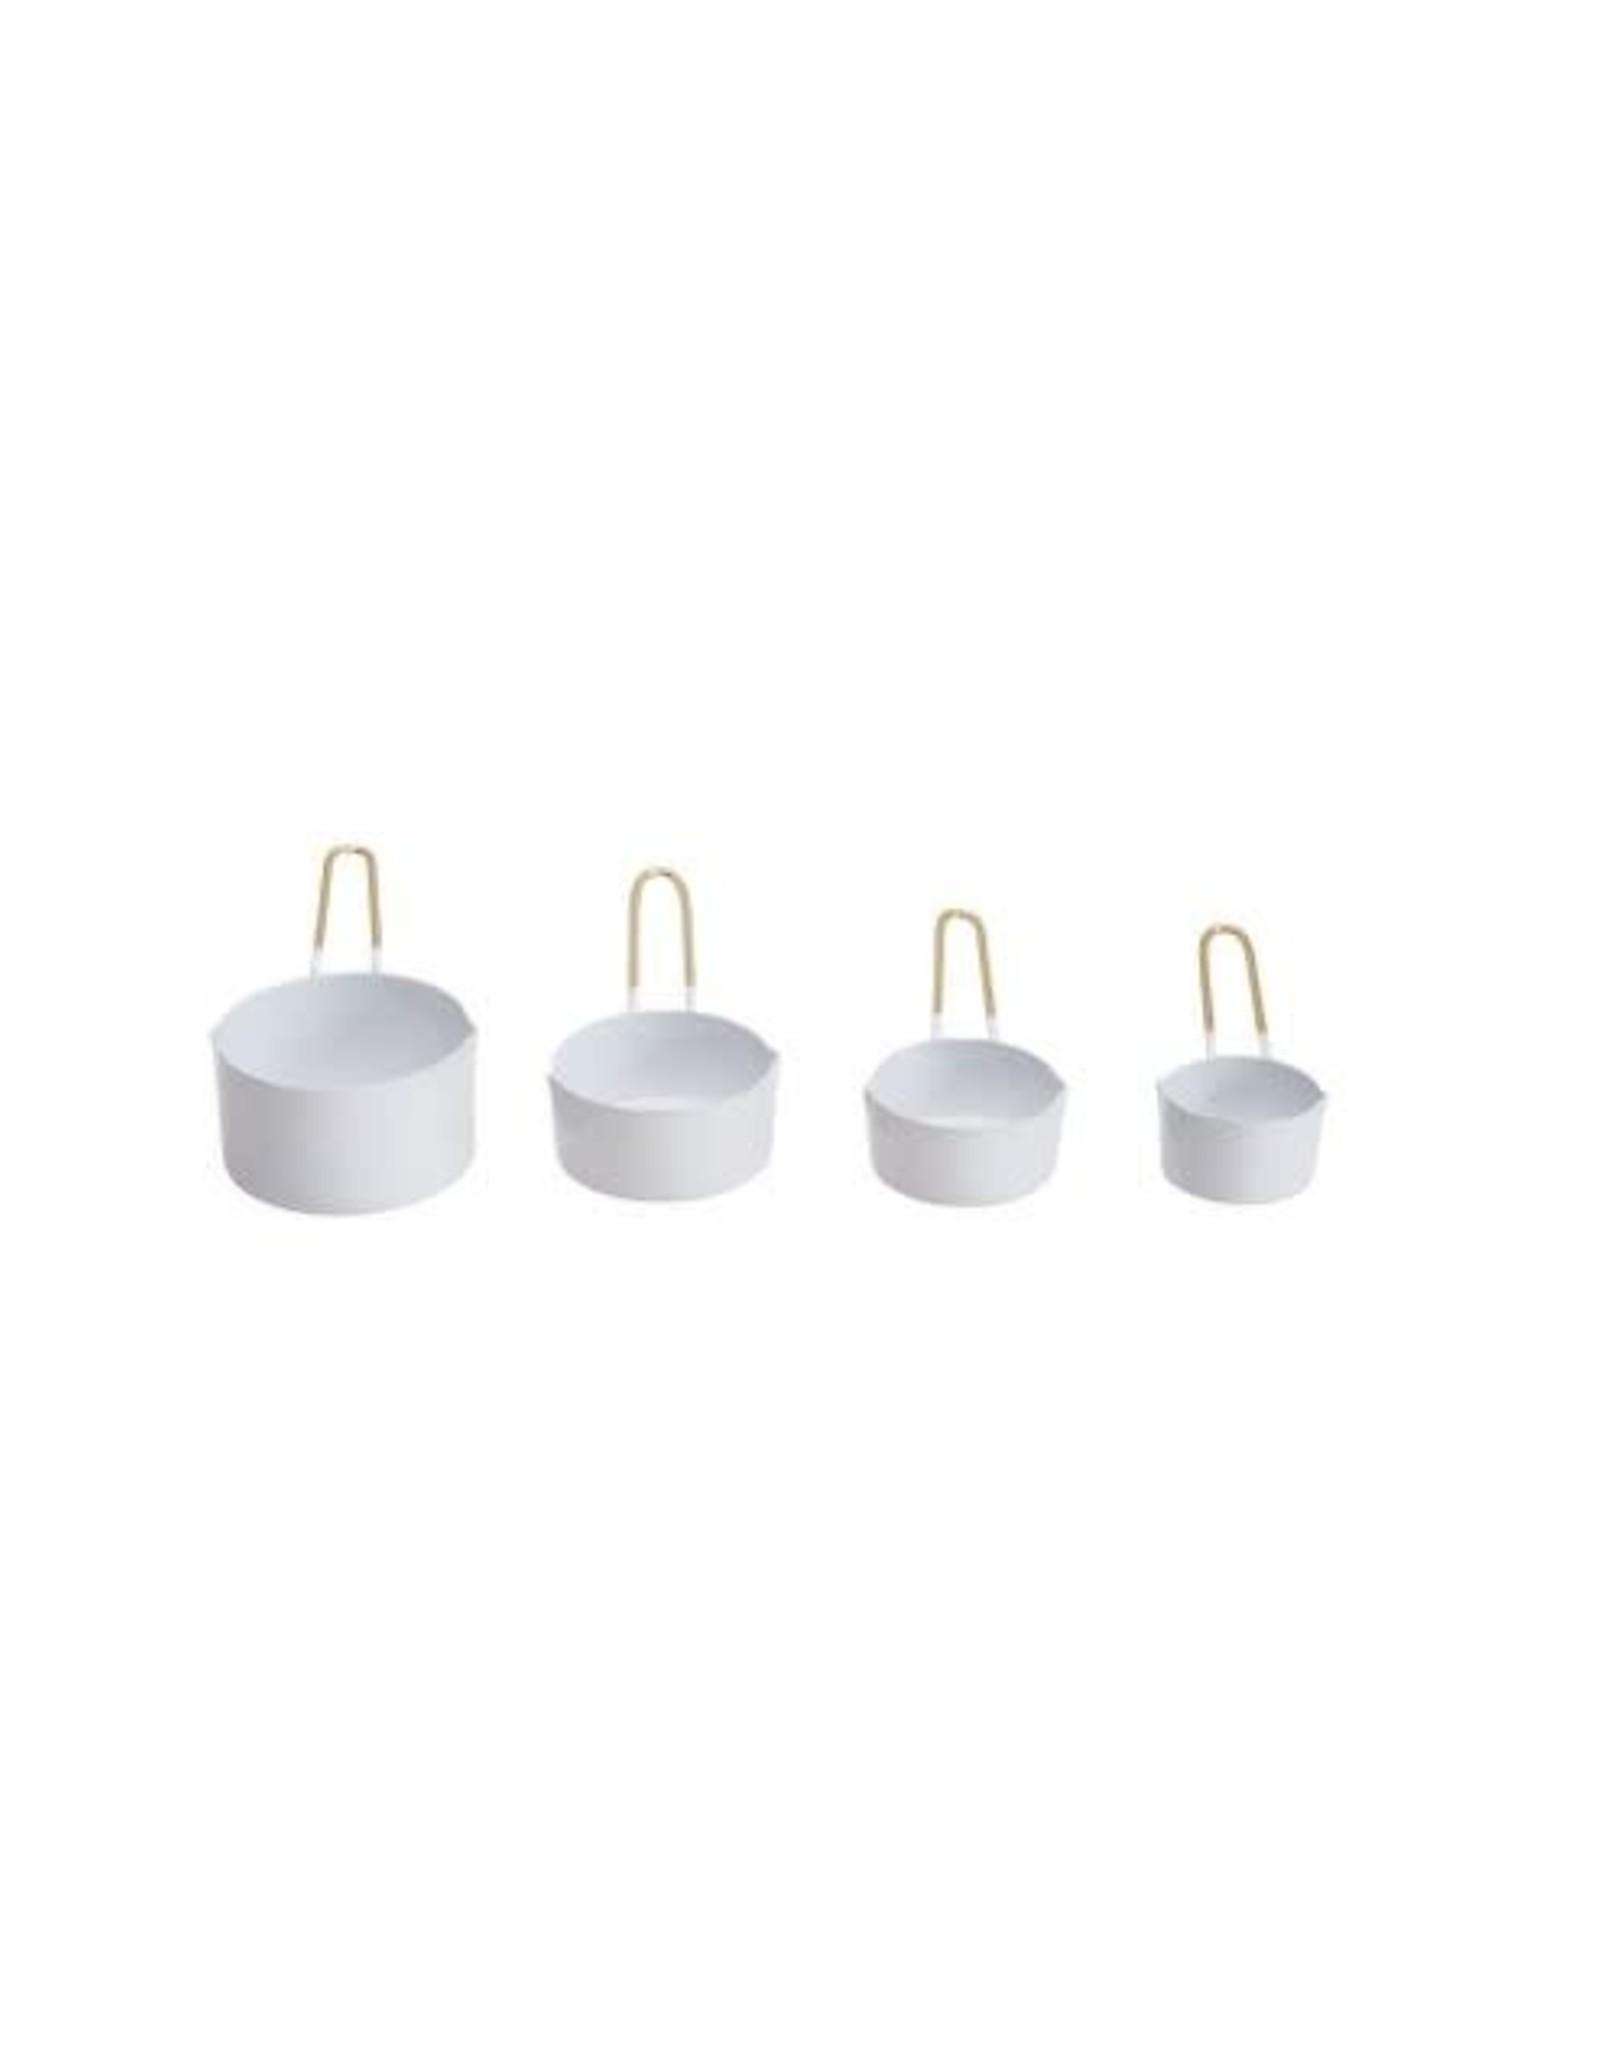 Enameled Measuring Cups - Set of 4